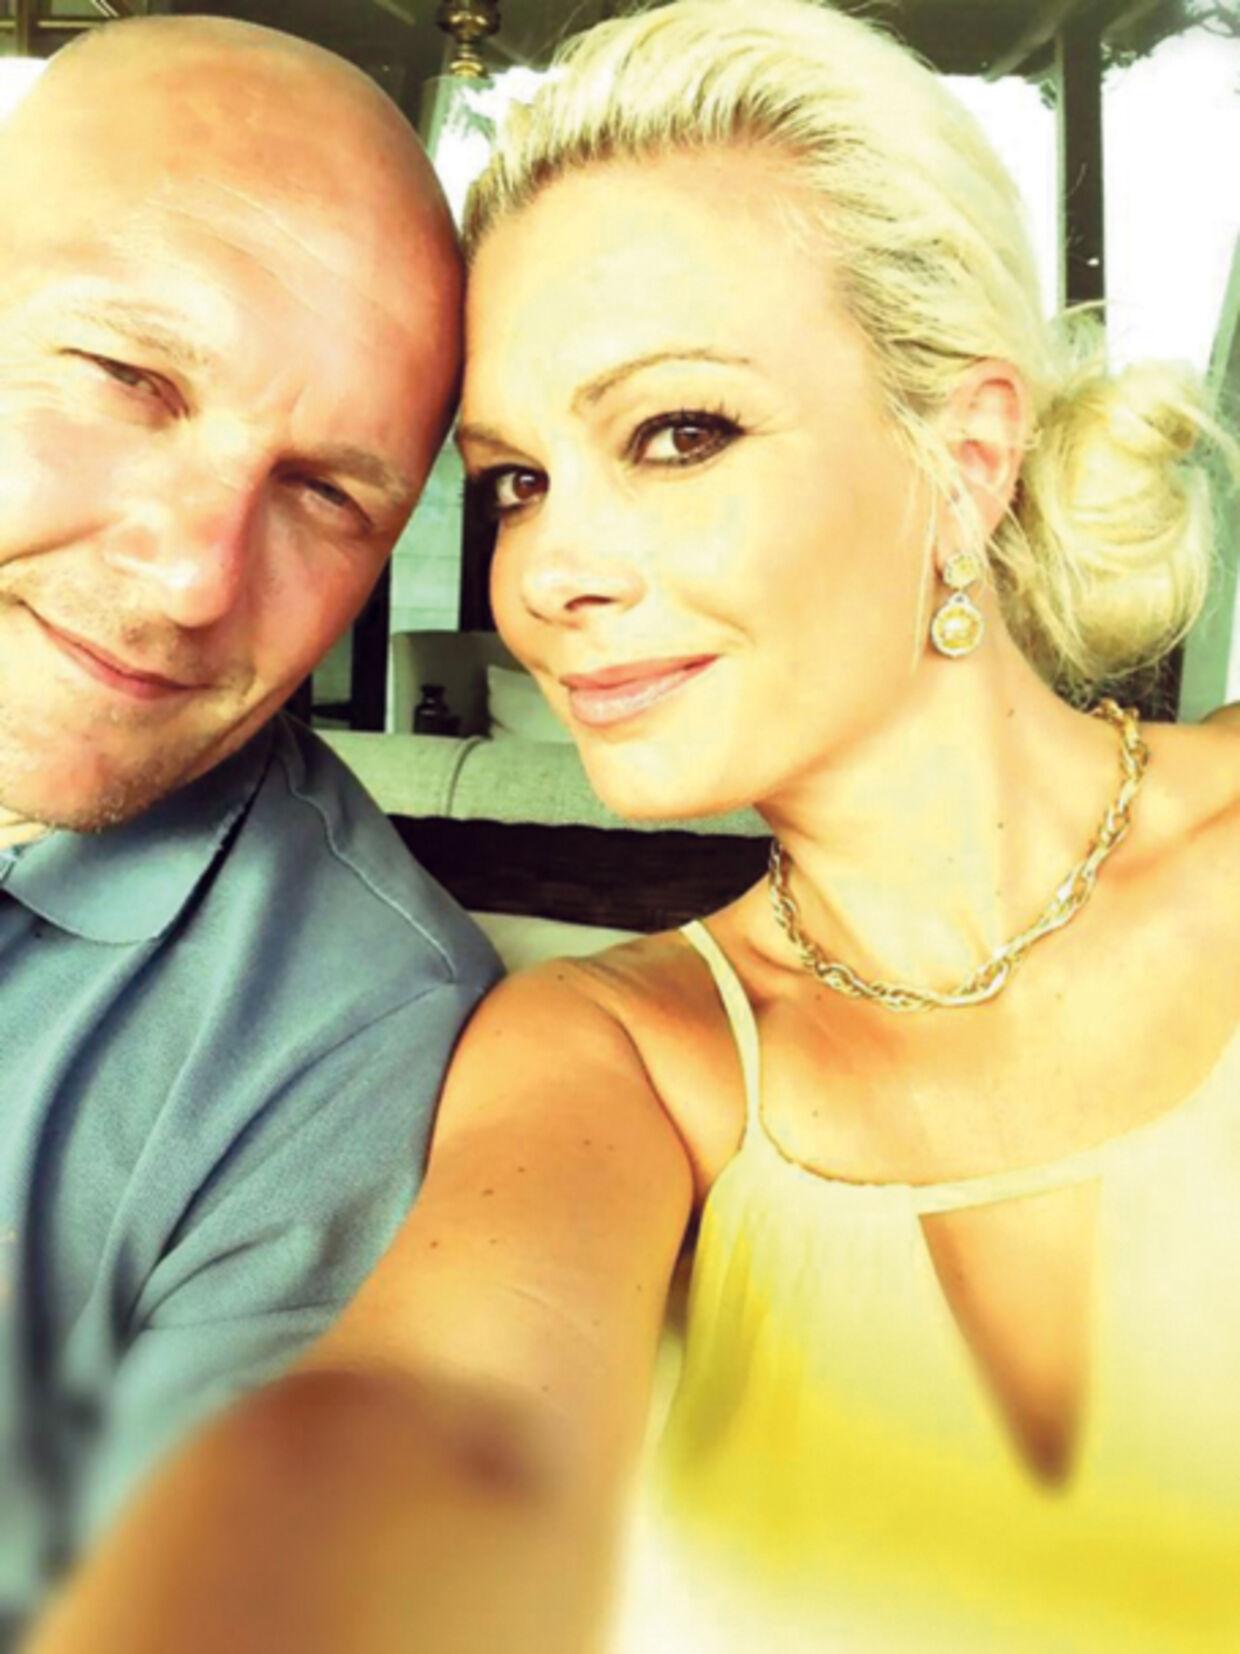 Thomas Gravesen stortrives tydeligvis i Las Vegas med den tjekkiskfødte model og ejendomsmægler Kamila Persse.